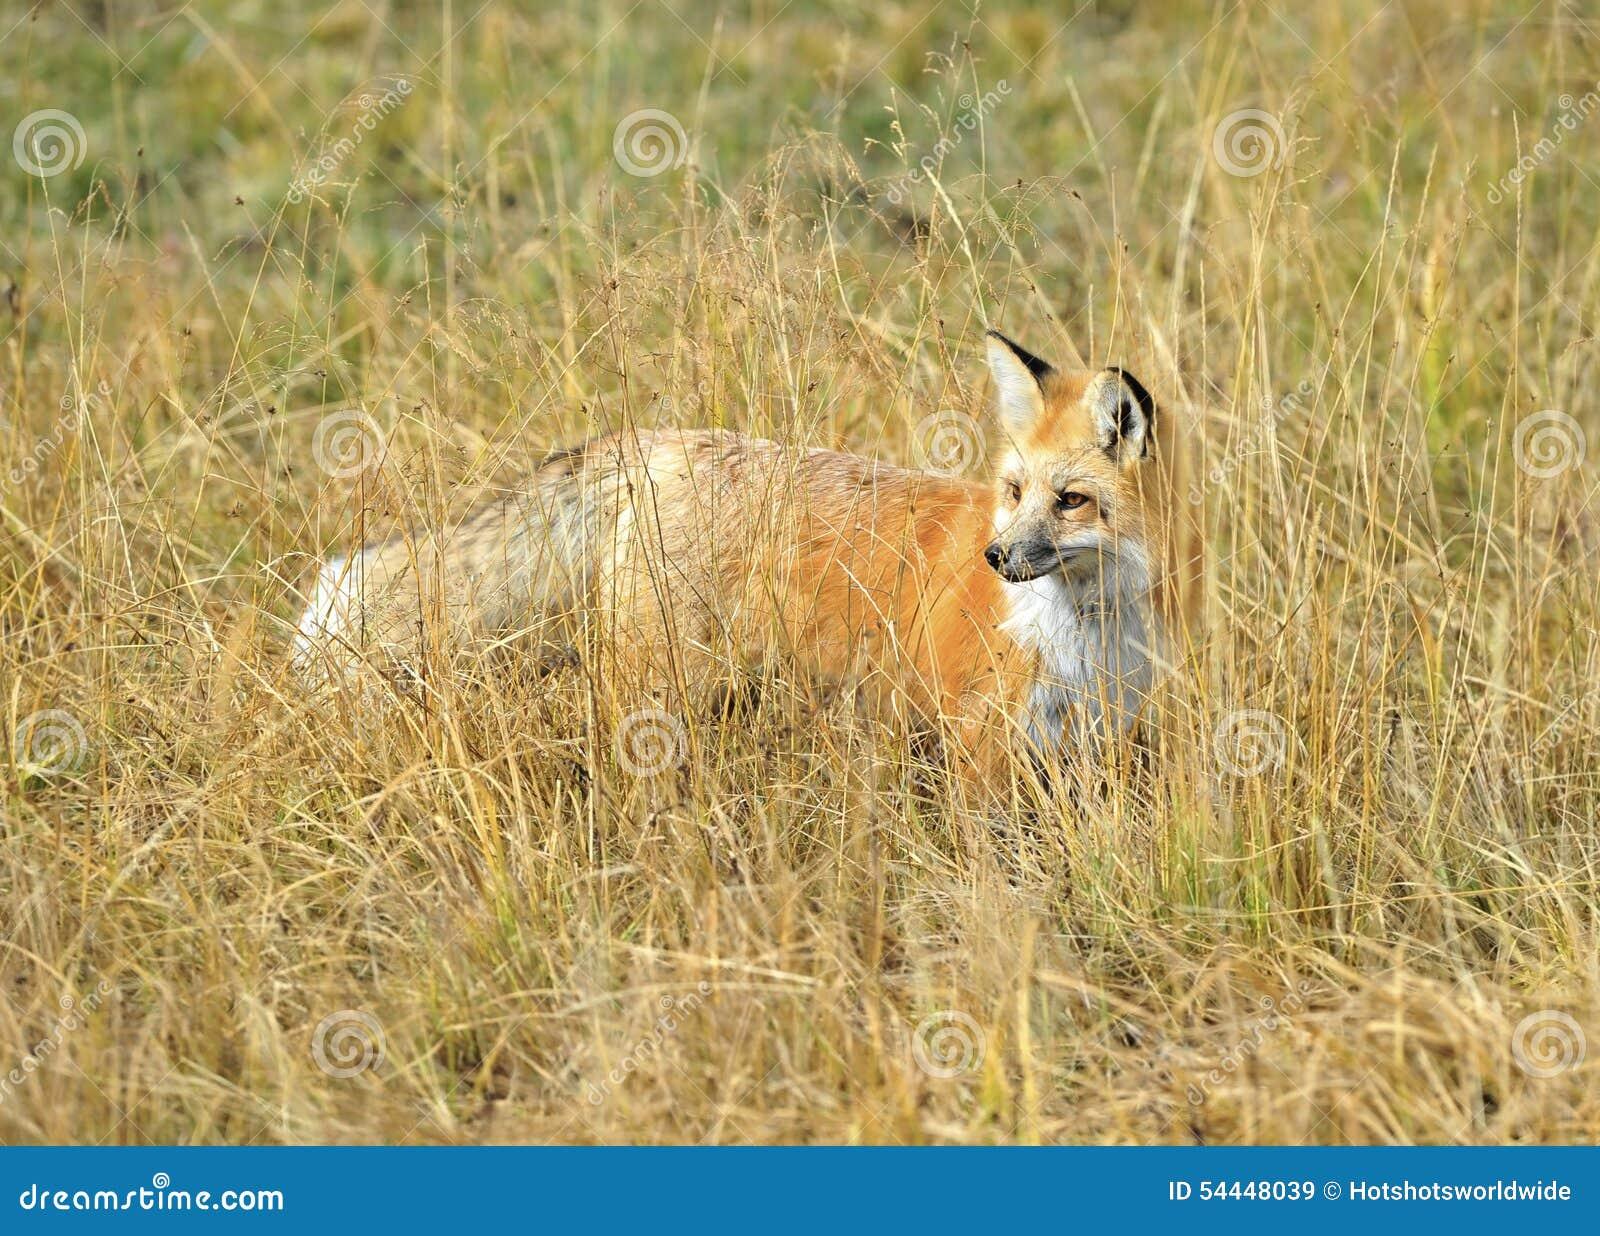 Toppig bergskedja nevada röd räv i gräs, yellowstone nationalpark, monta